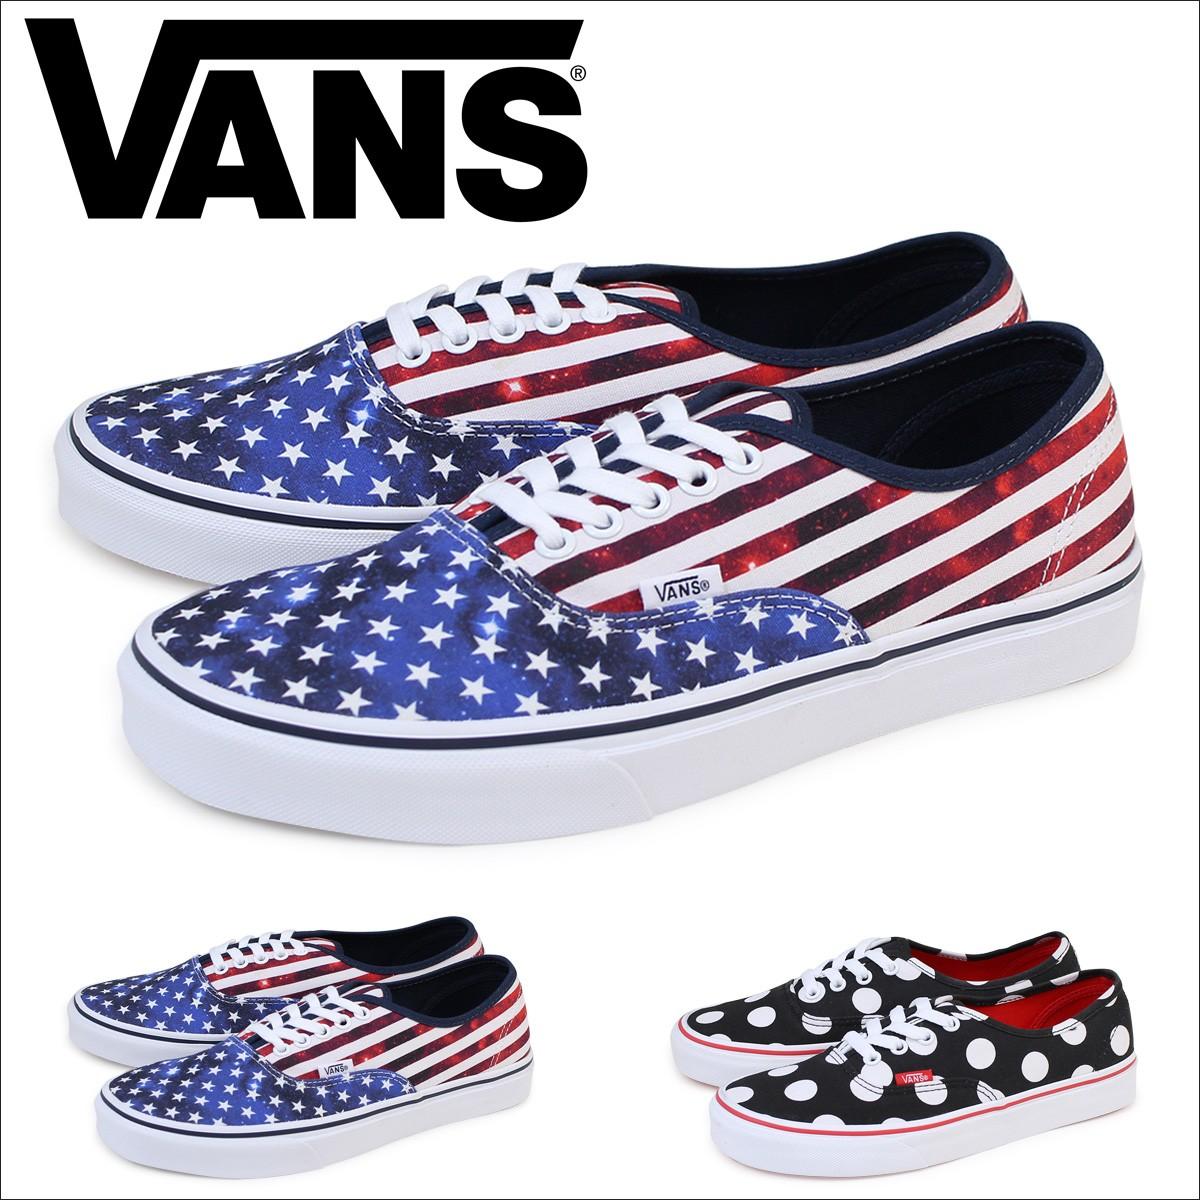 VANS オーセンティック スニーカー メンズ バンズ ヴァンズ AUTHENTIC VN0004MLJOD VN0004MLJPD 靴